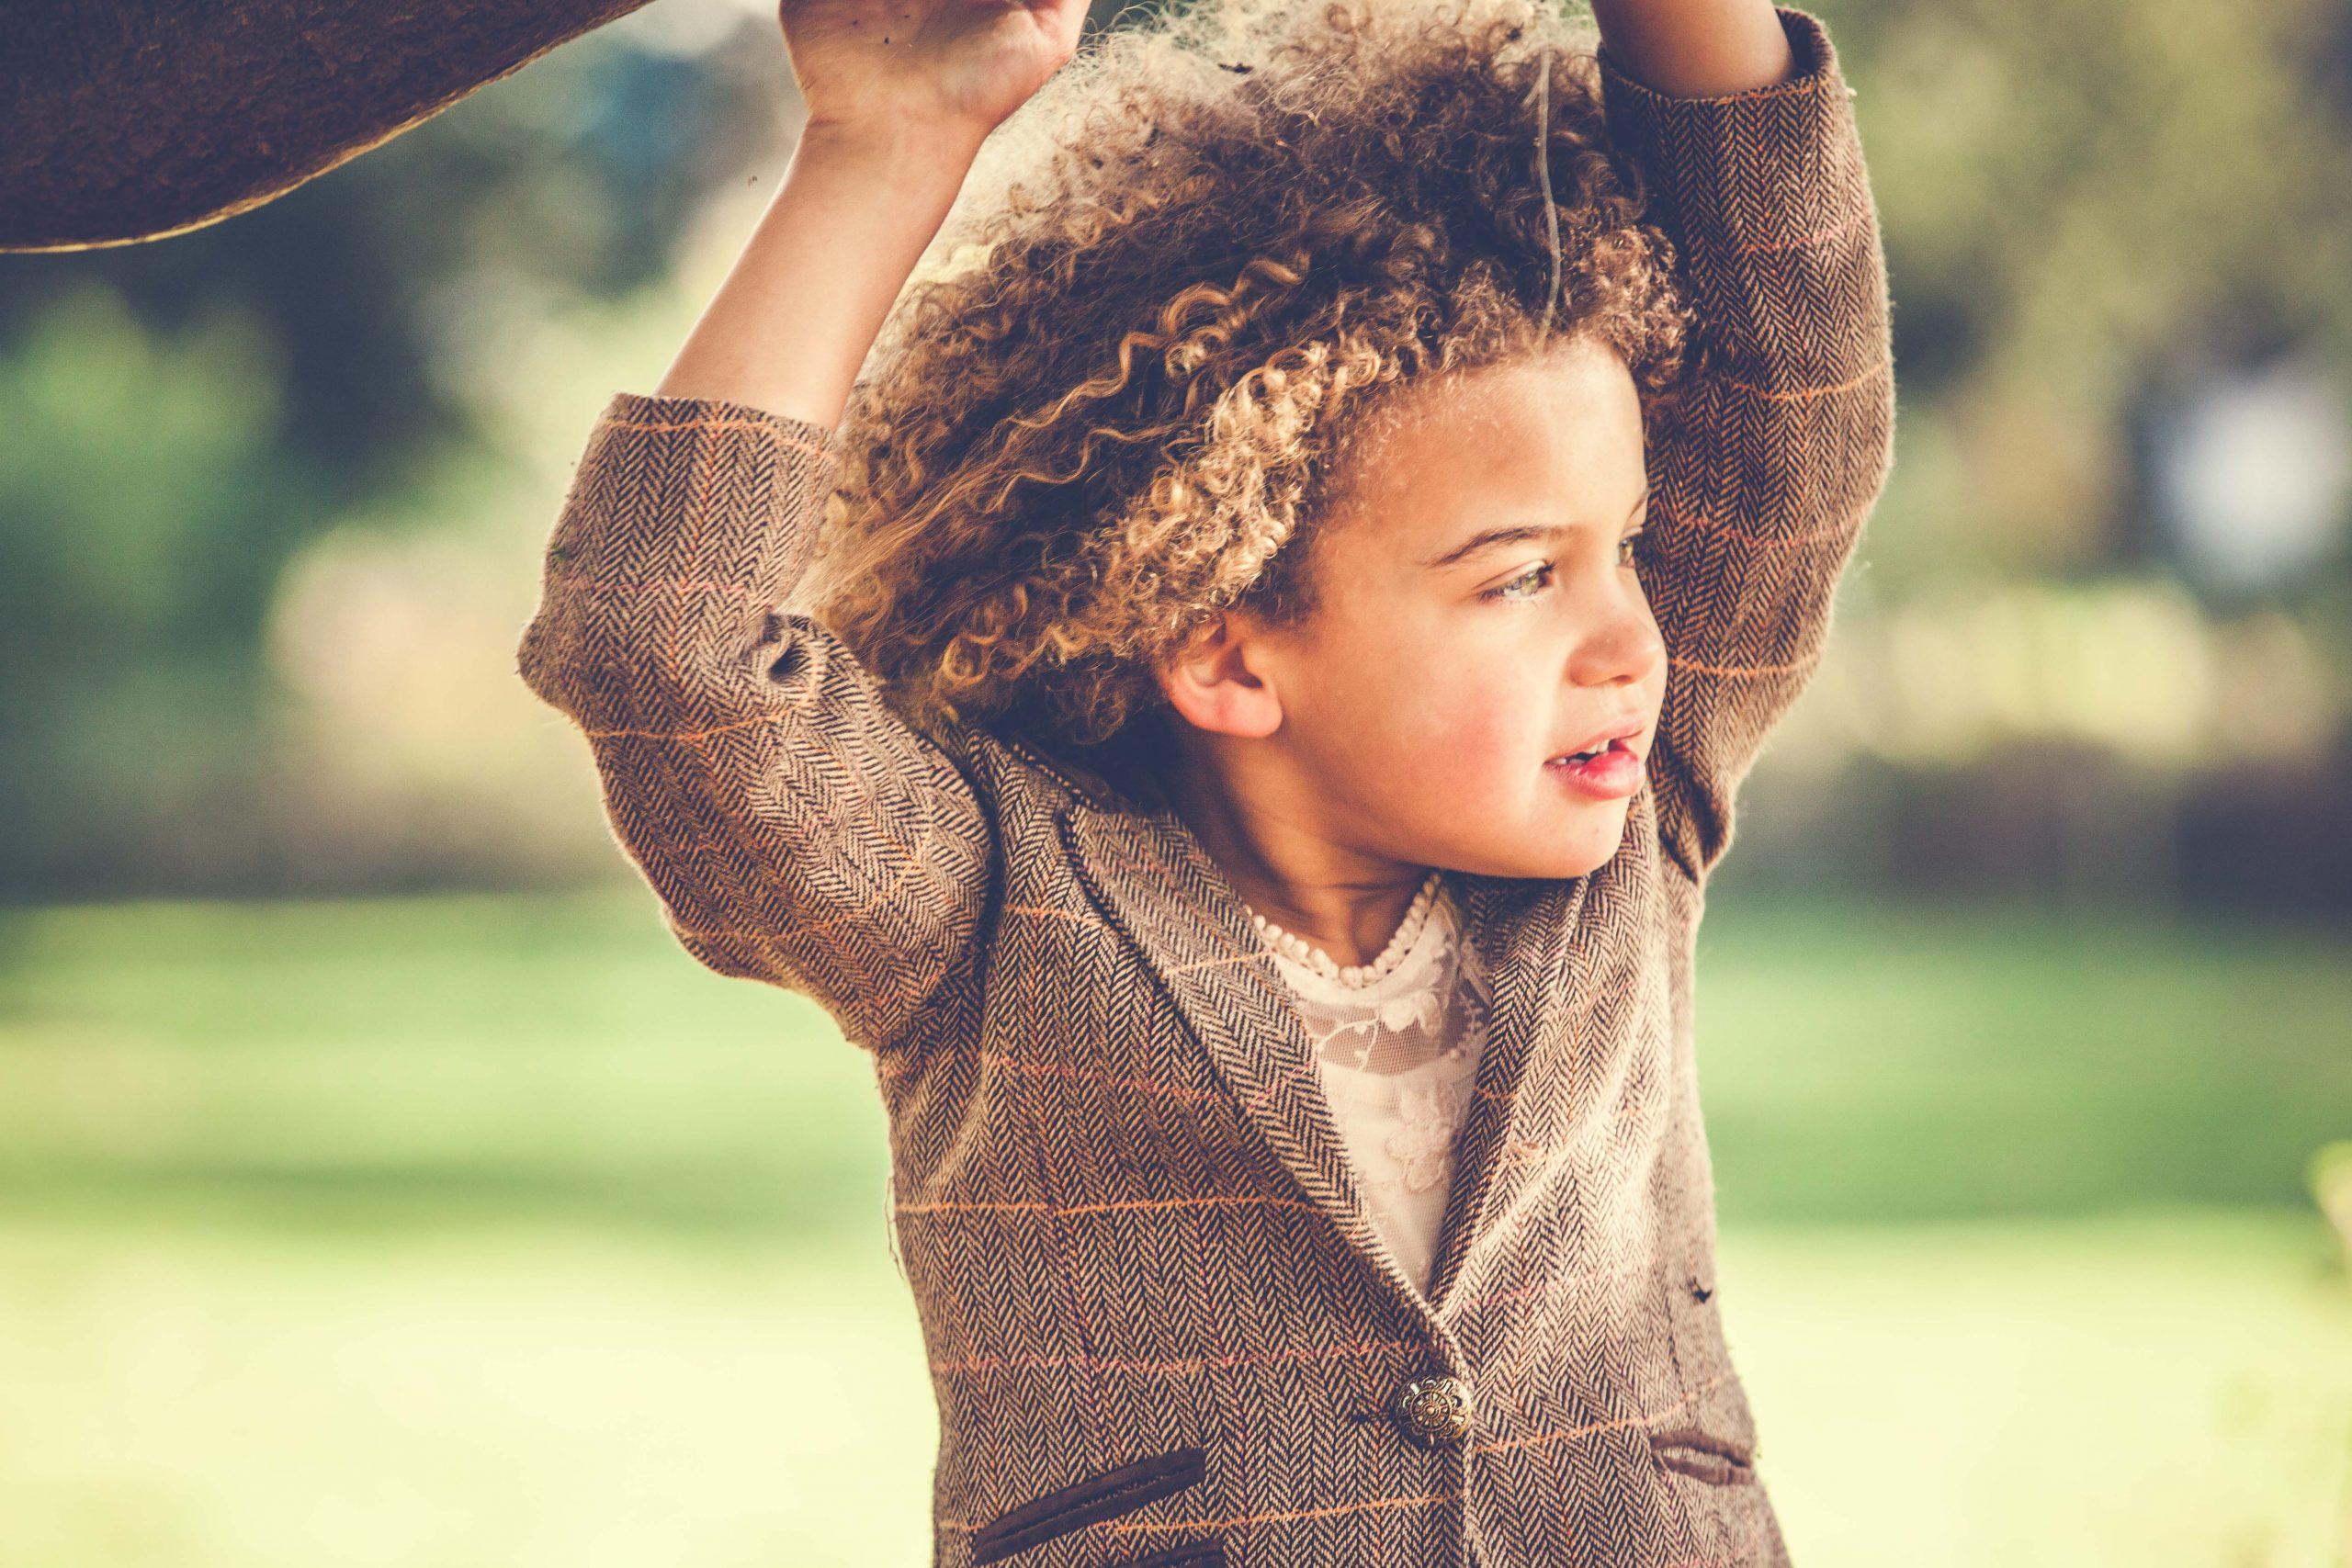 Kids Mini-shoot, Pontypool, Model kids, Child Photography, Tania Miller Photography